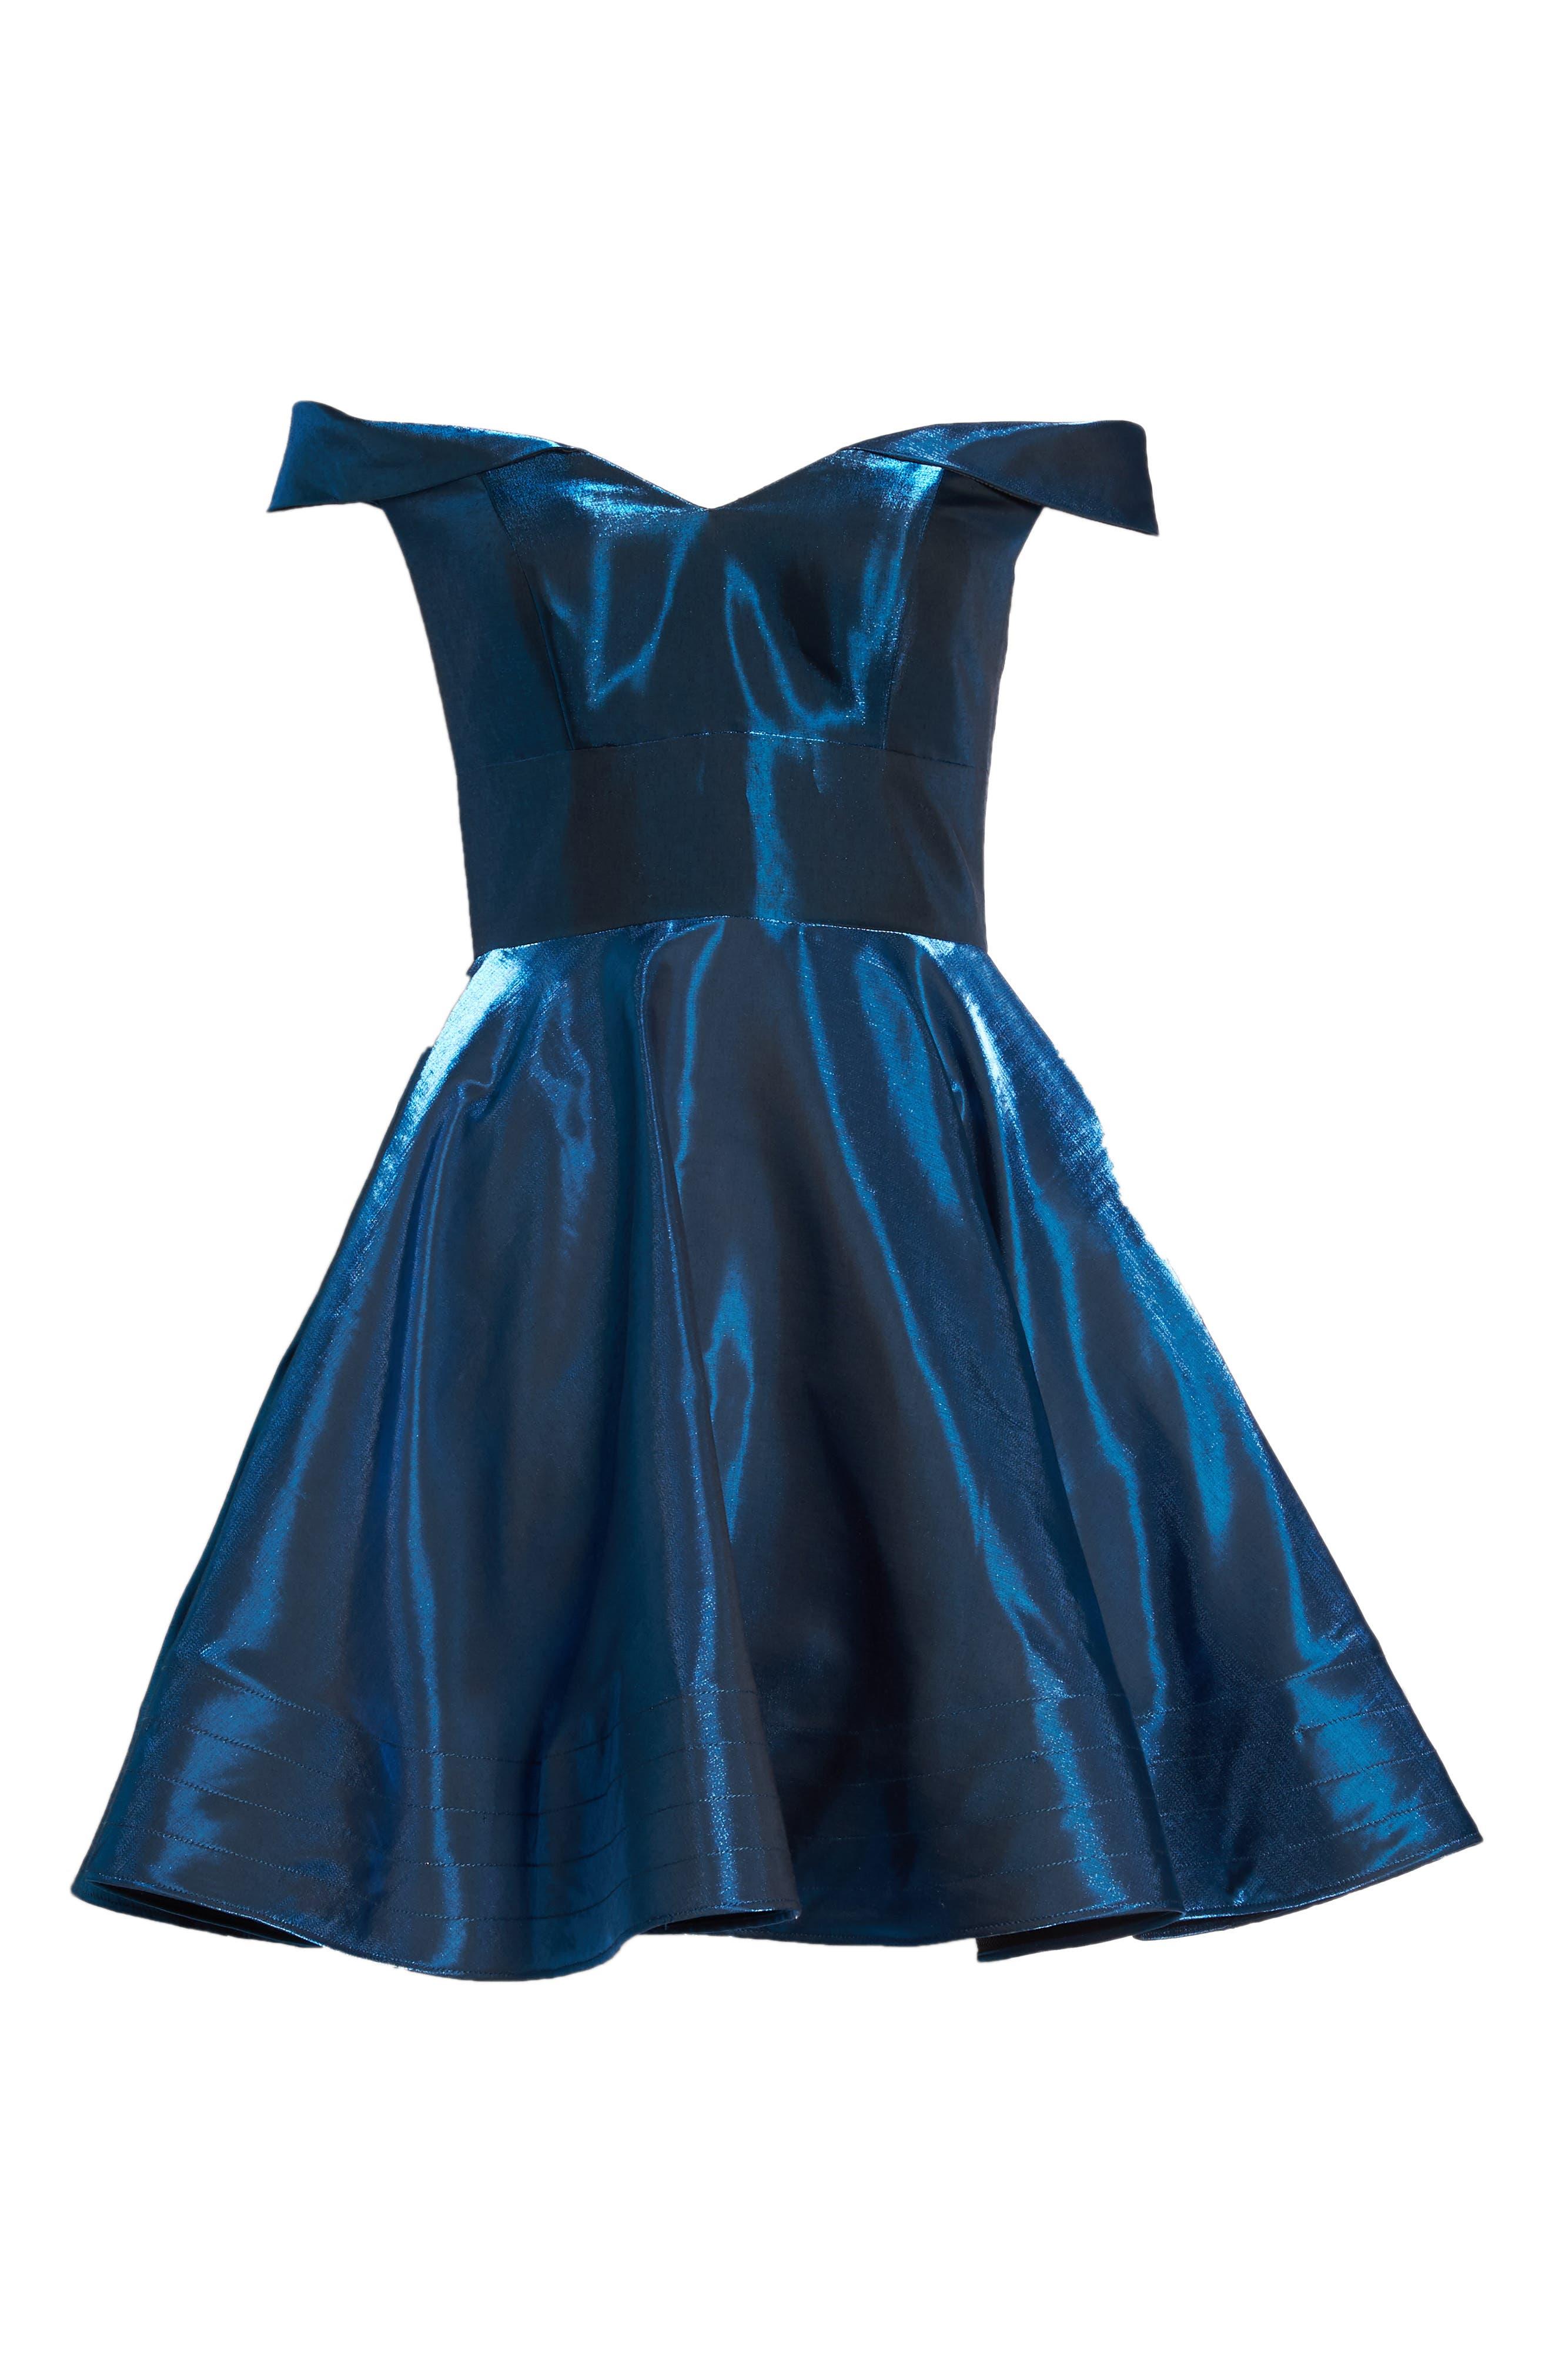 Off the Shoulder Shimmer Party Dress,                             Alternate thumbnail 7, color,                             450